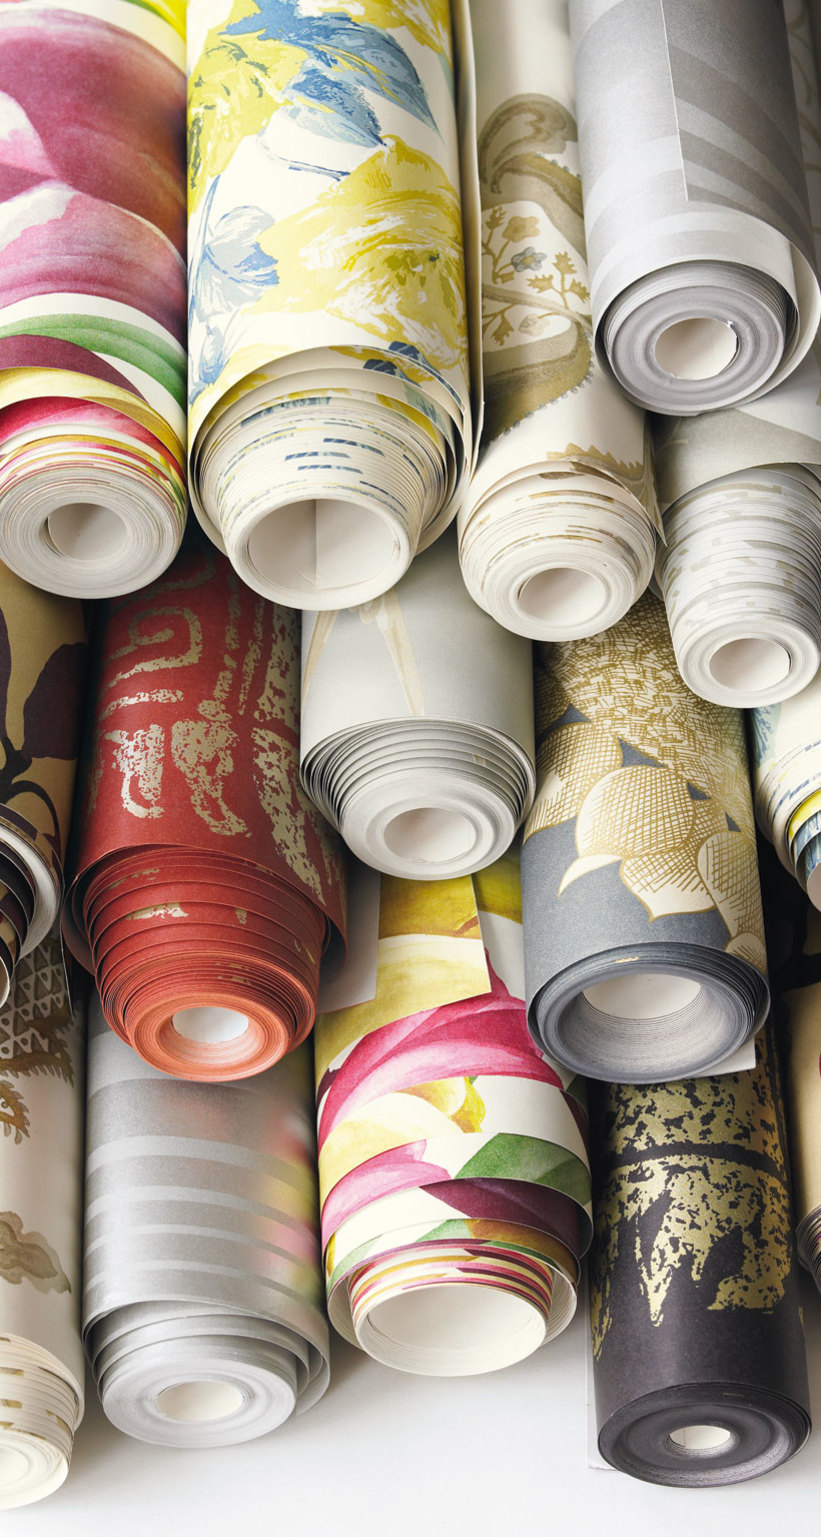 zoffany wallpaper stockists